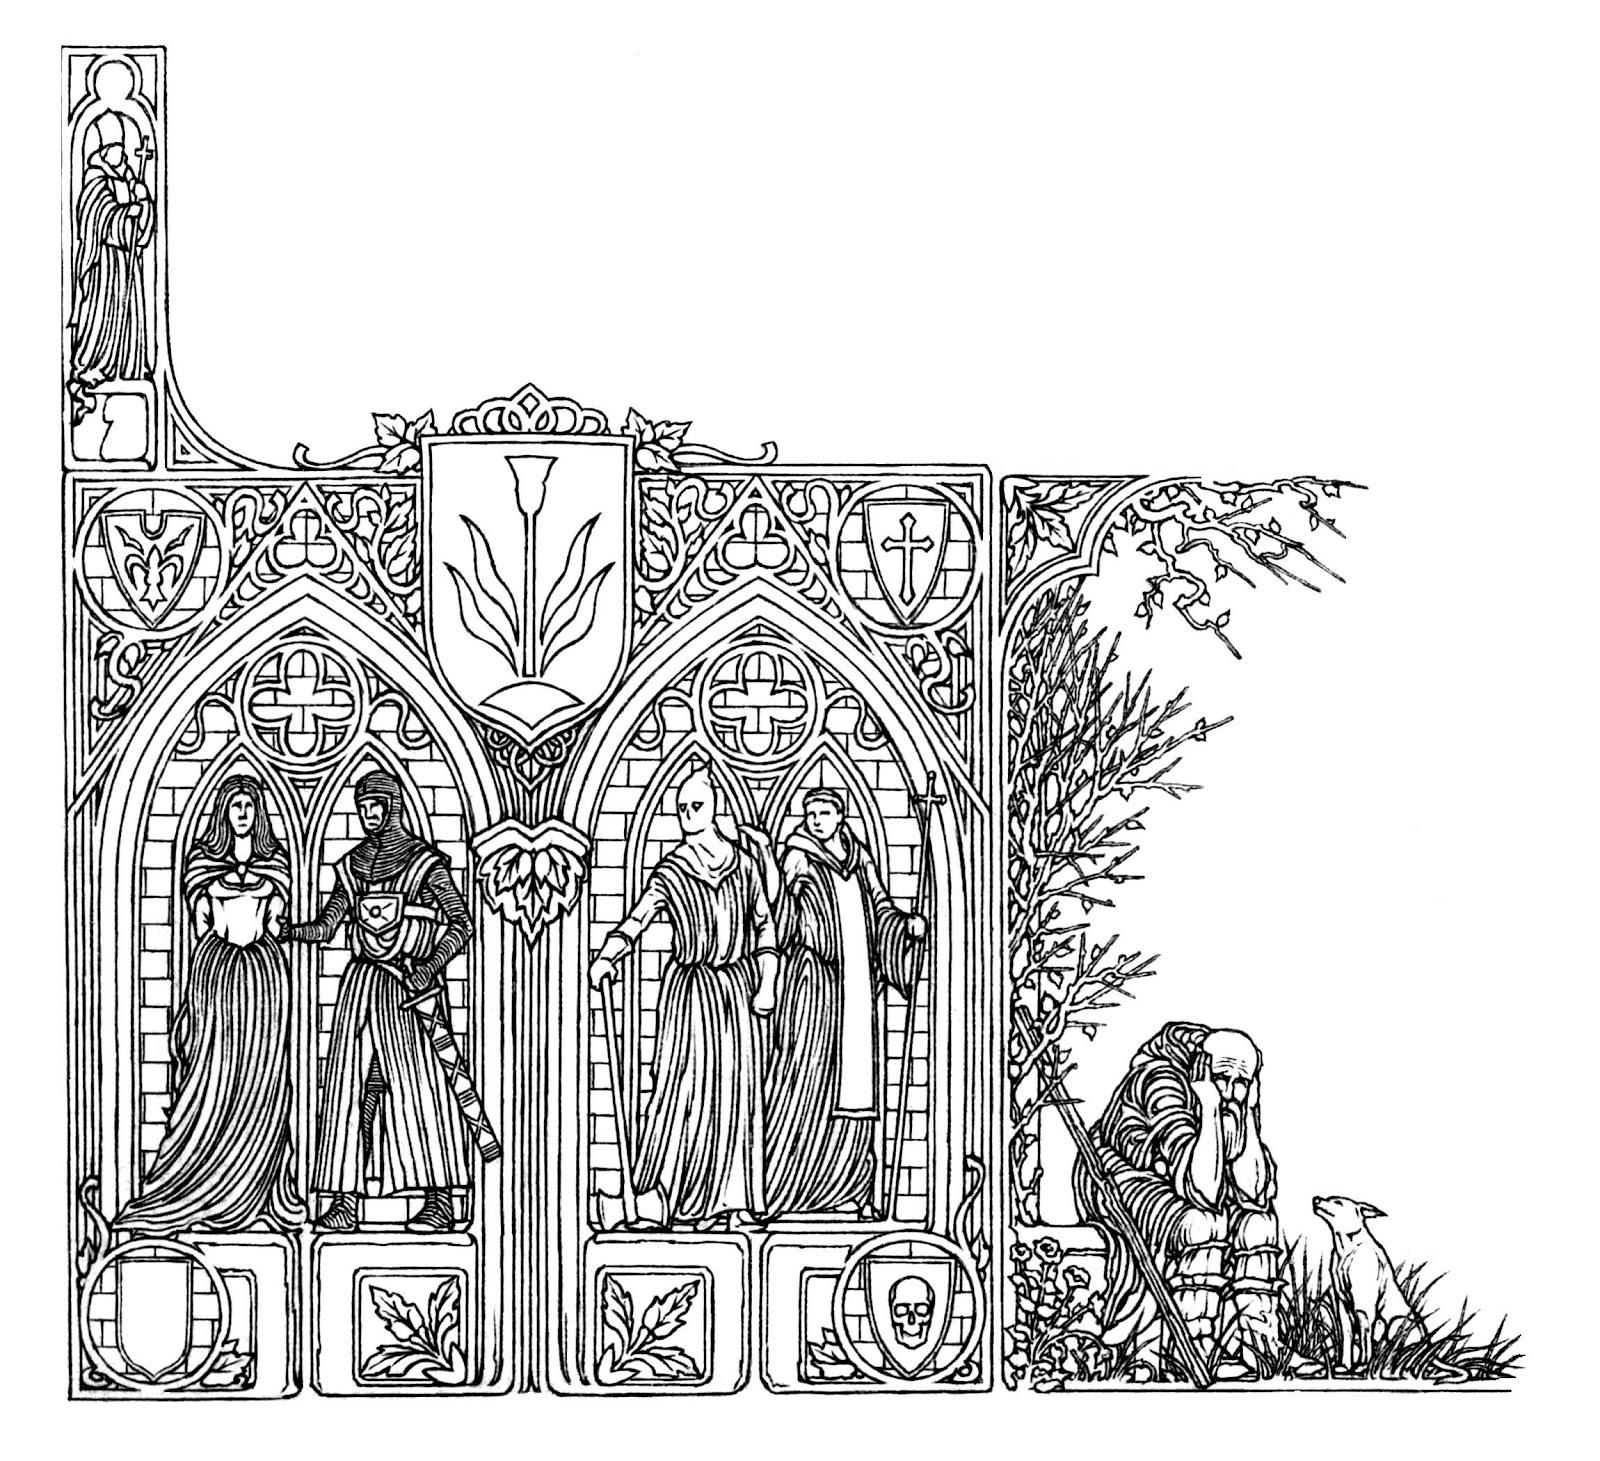 GÓTIKUS SAROKDÍSZ III (WITCHES VII).jpg